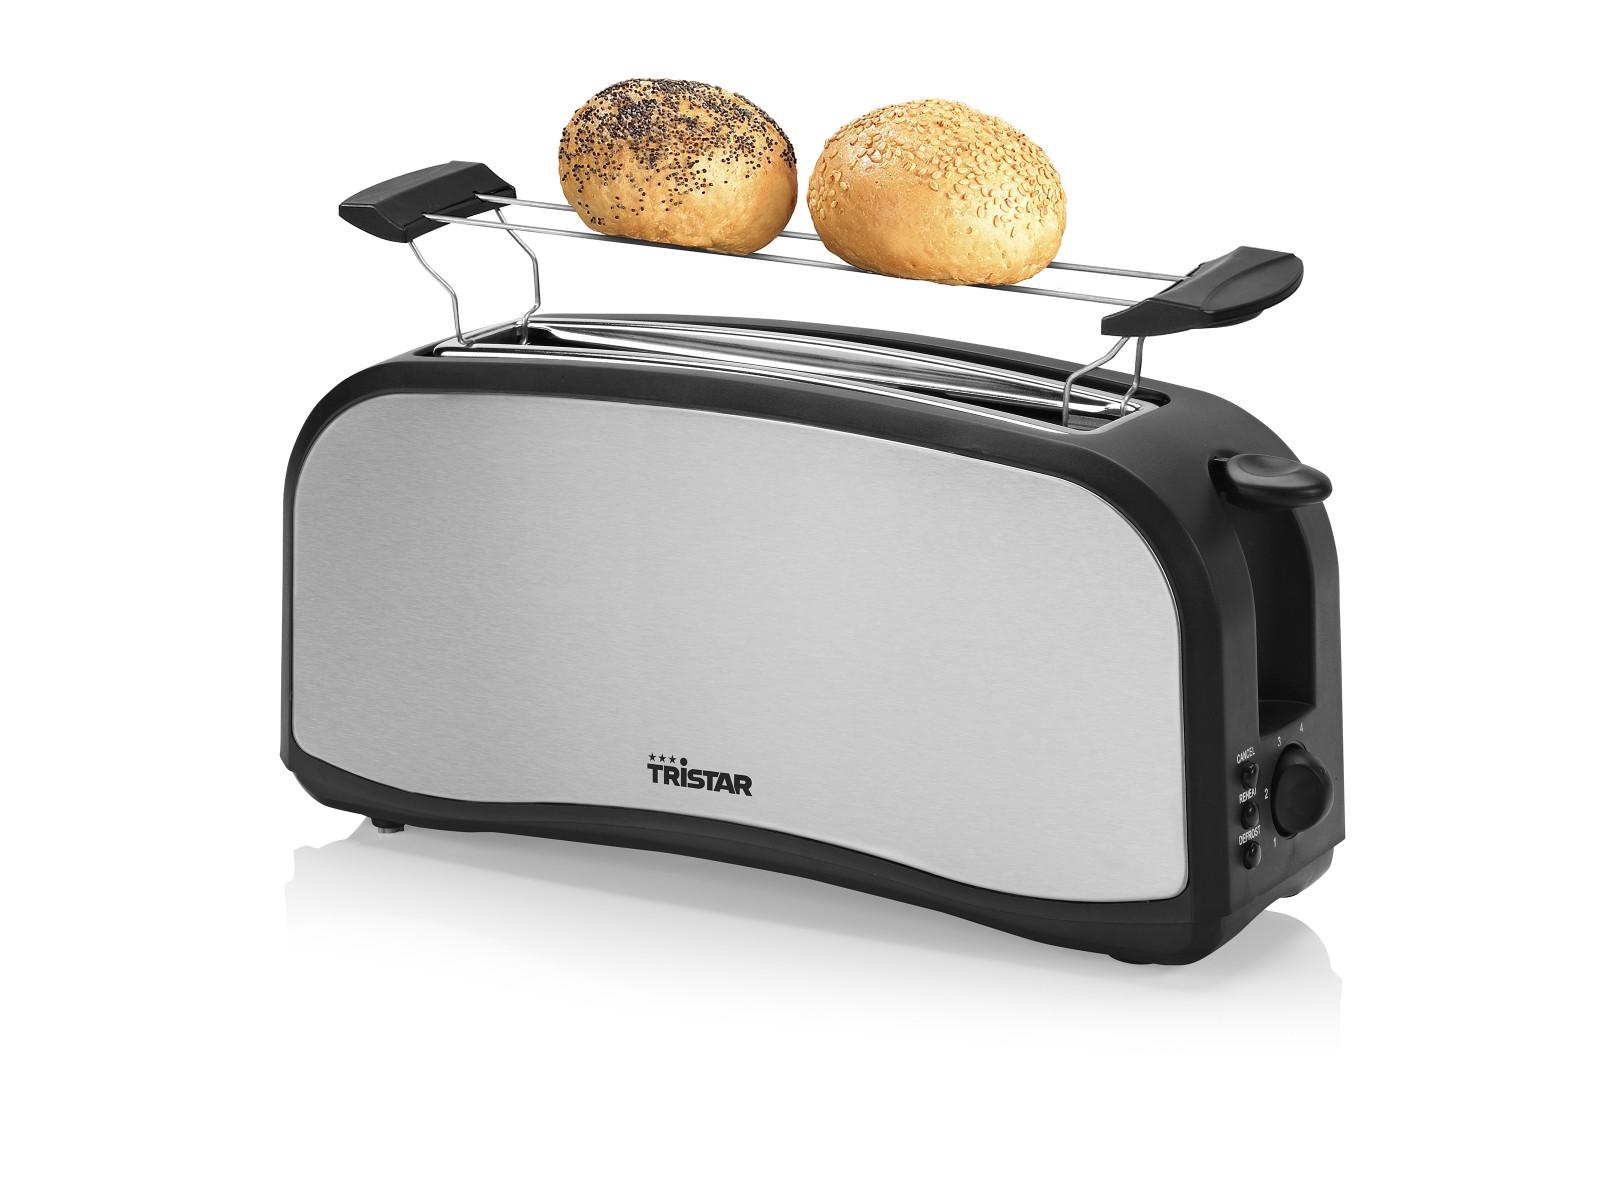 Langschlitz Toaster Tristar BR-2138 – Bild 1